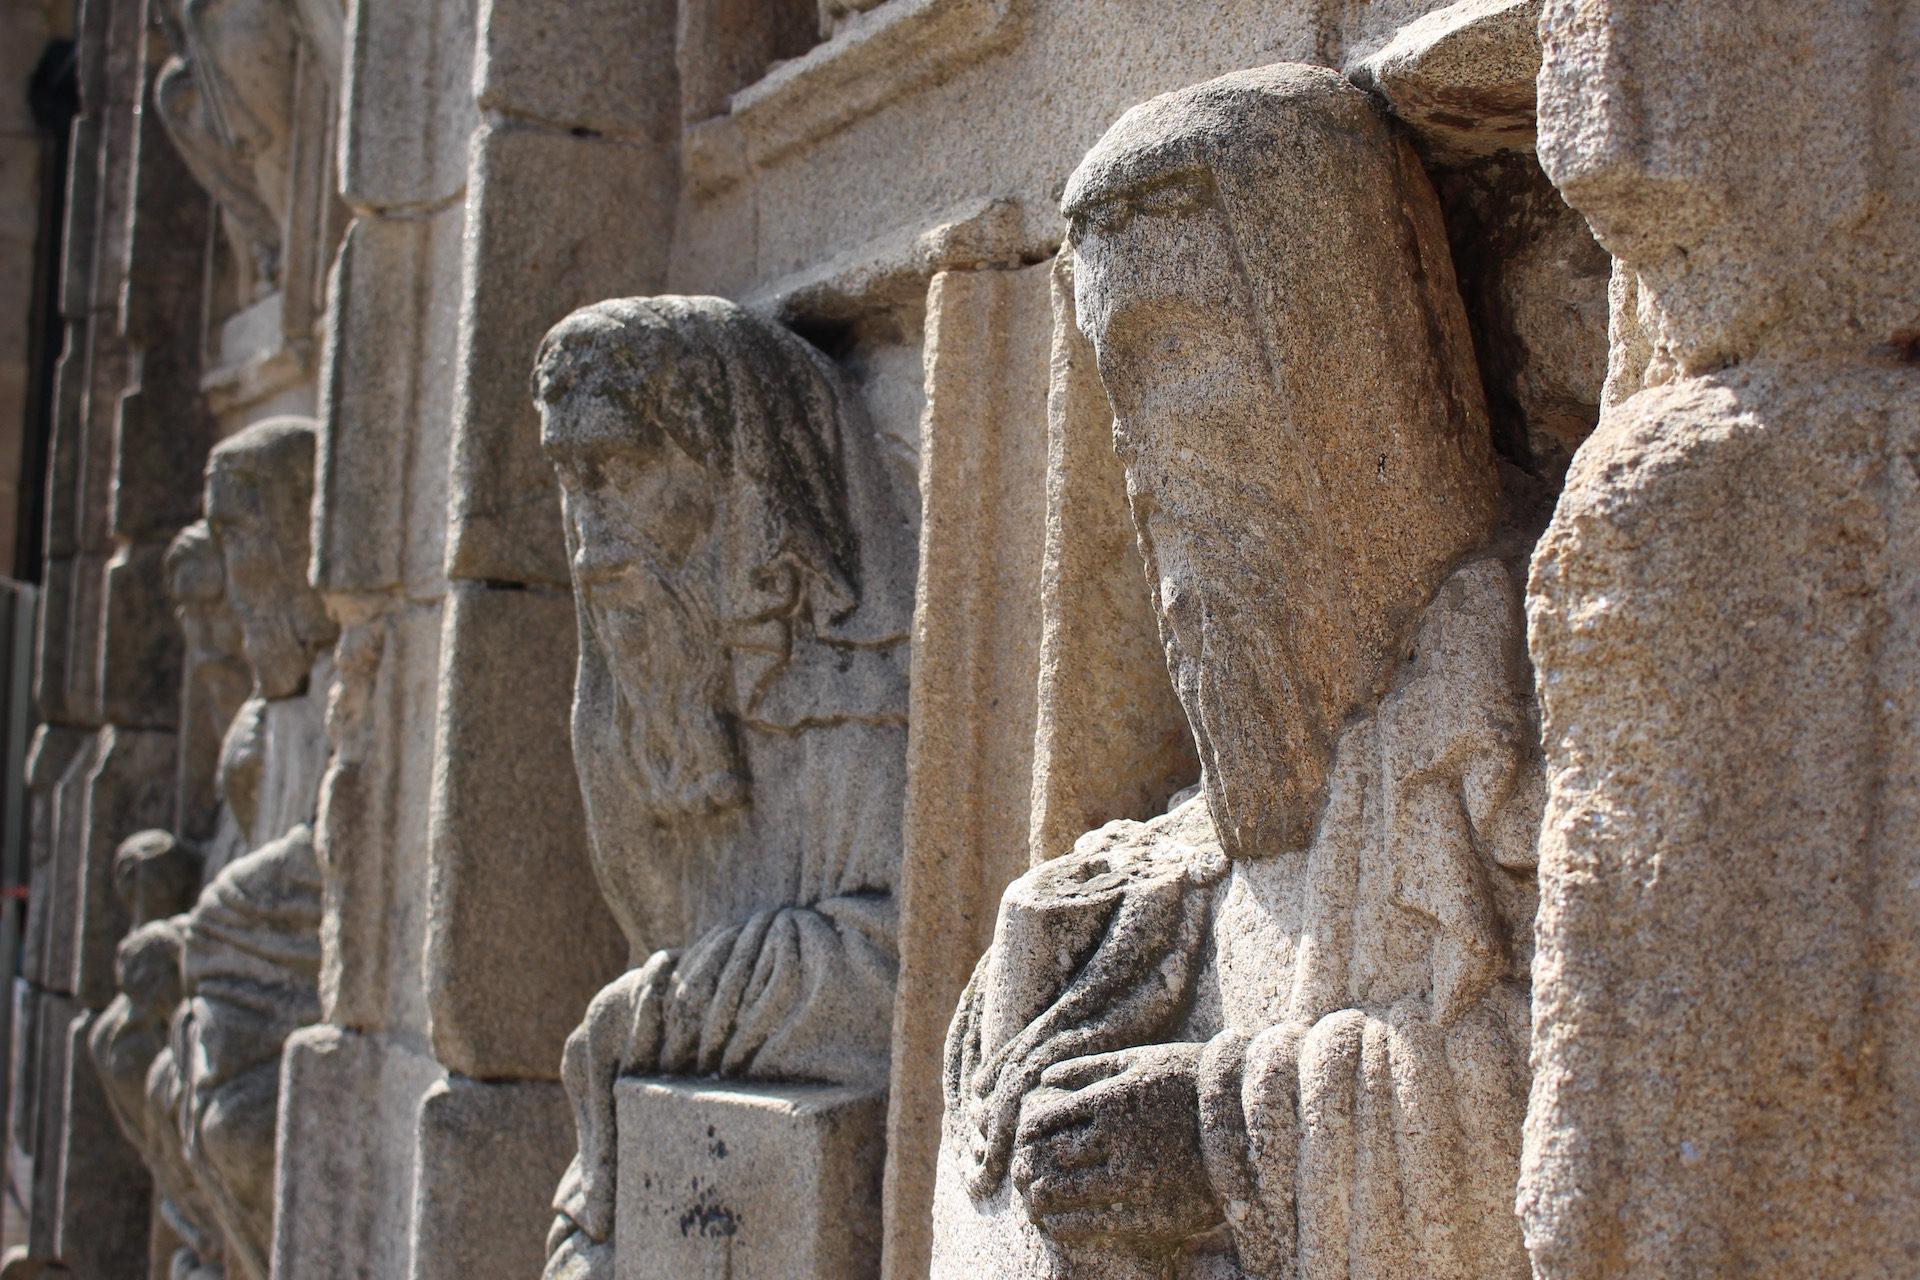 Statuen, Stein, Zahlen, Kathedrale, Santiago Compostela - Wallpaper HD - Prof.-falken.com